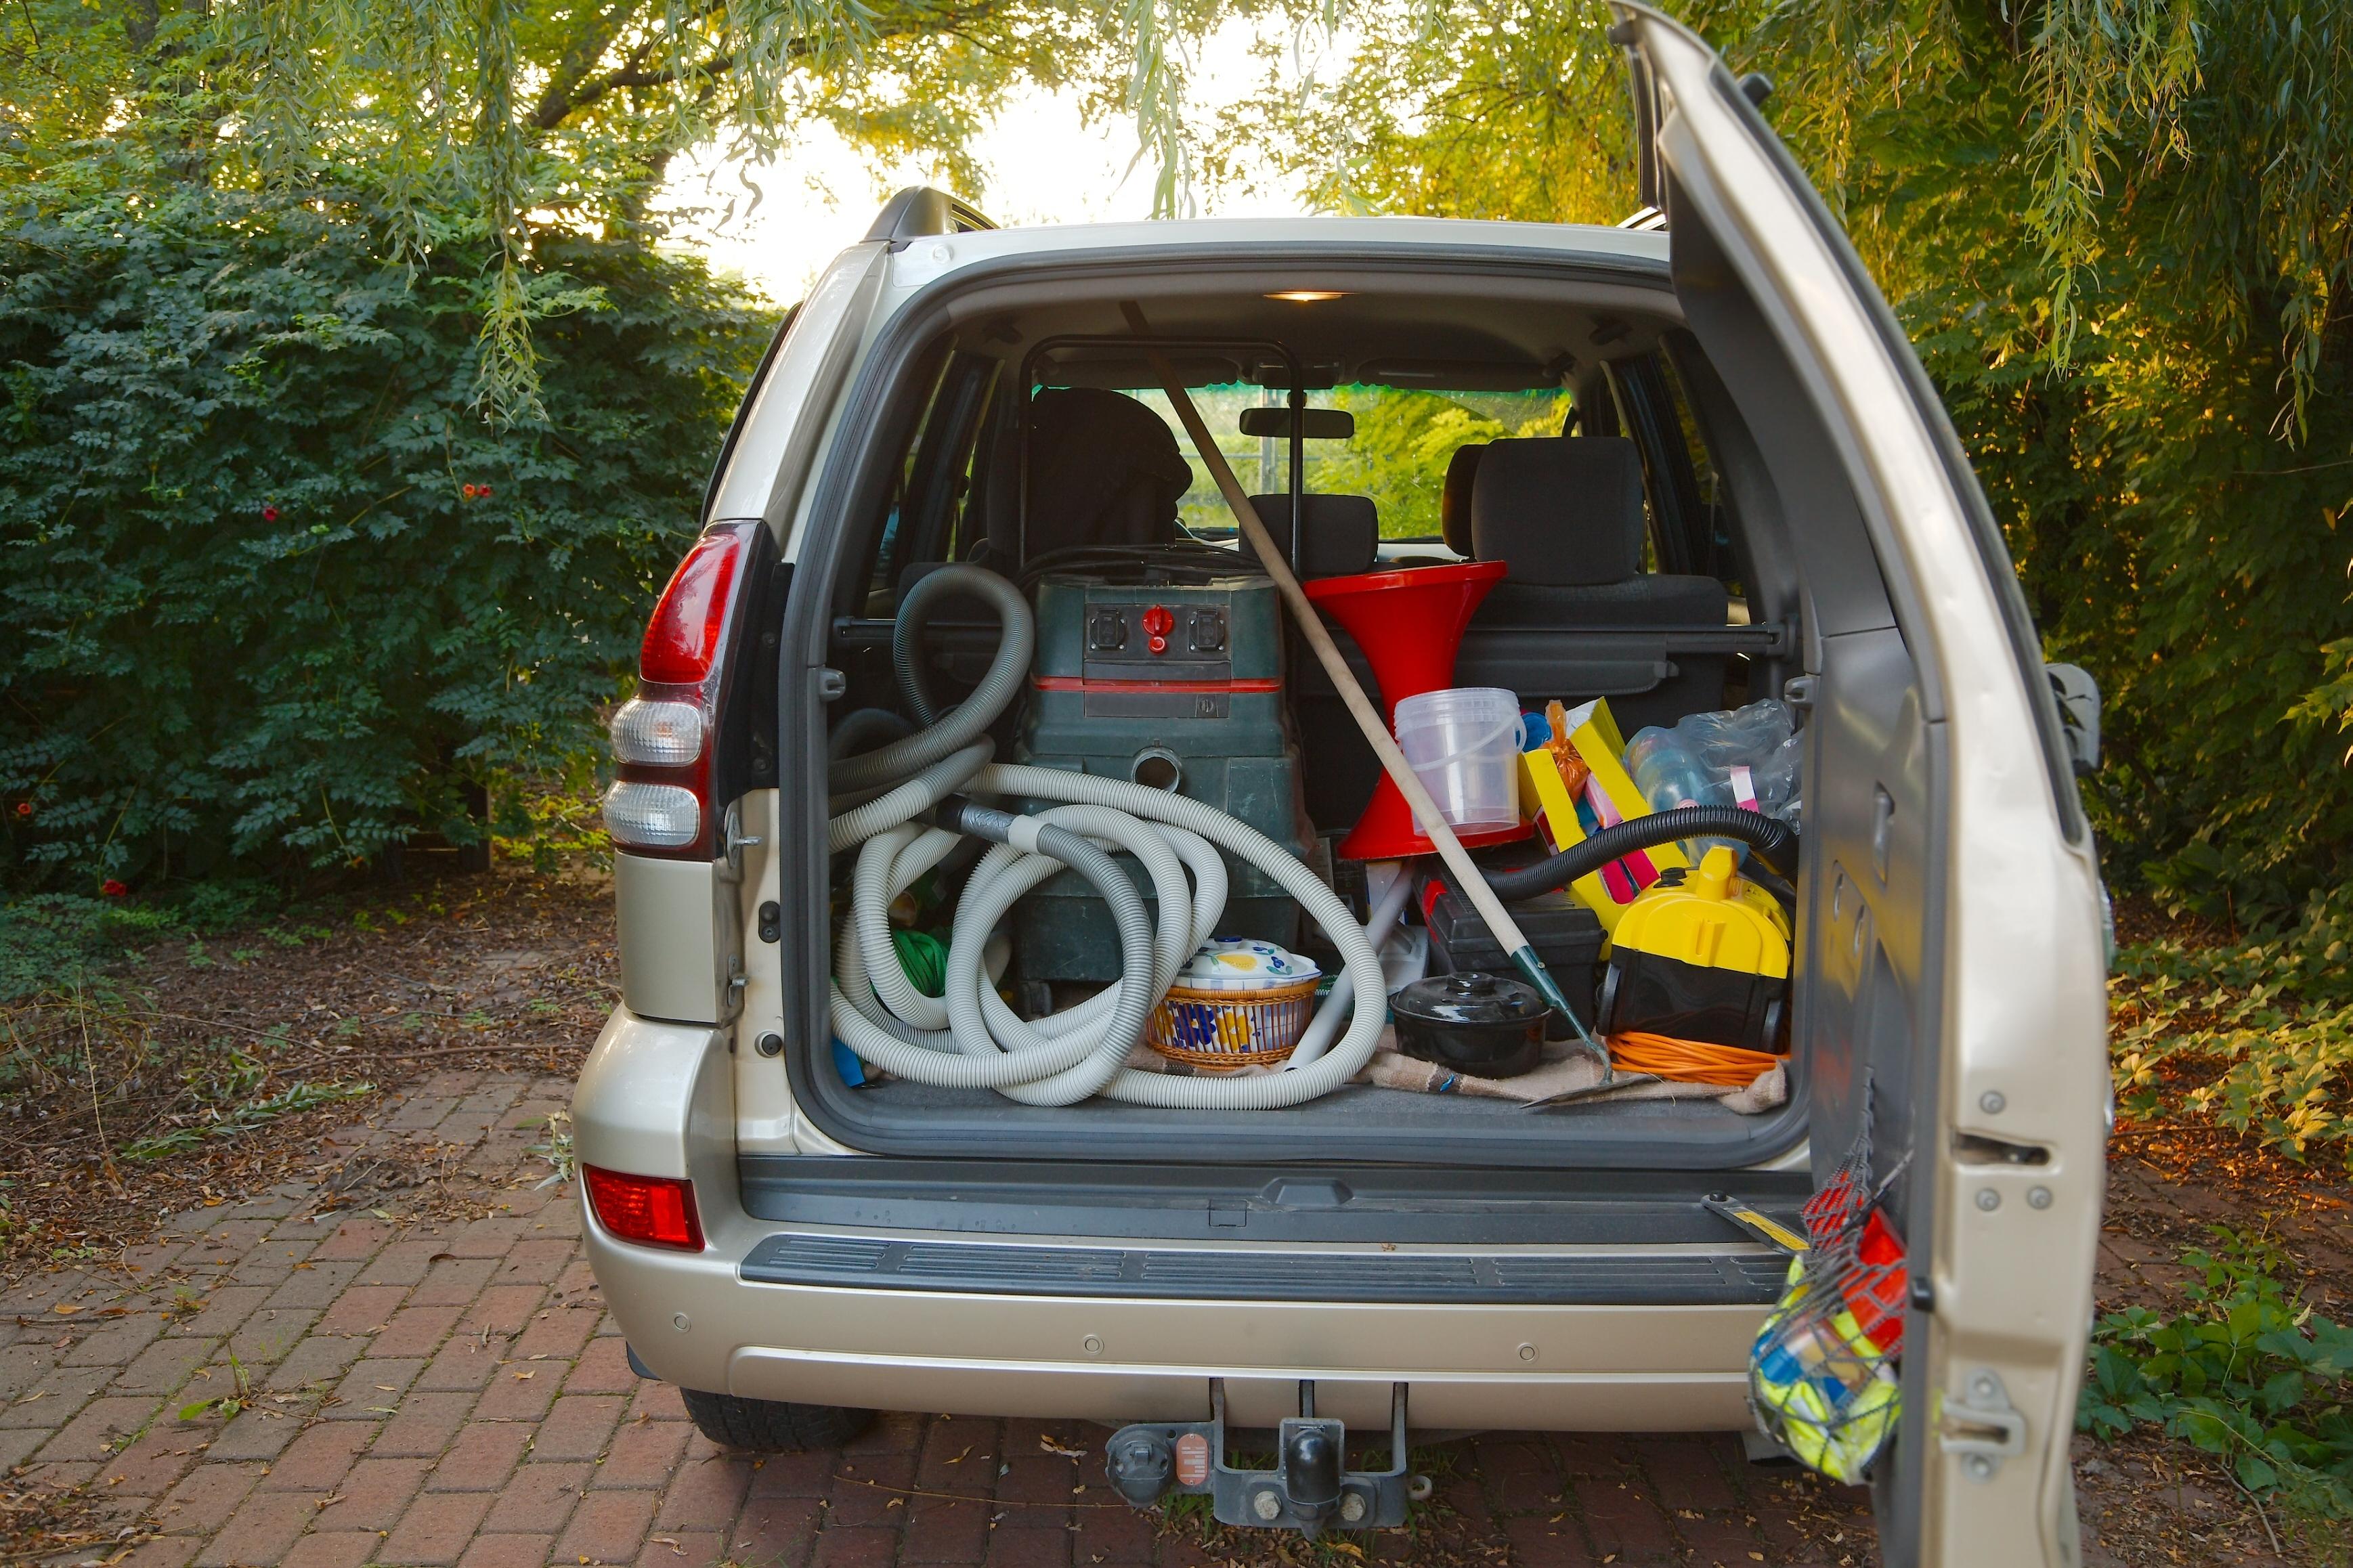 Car transport - Trunk full